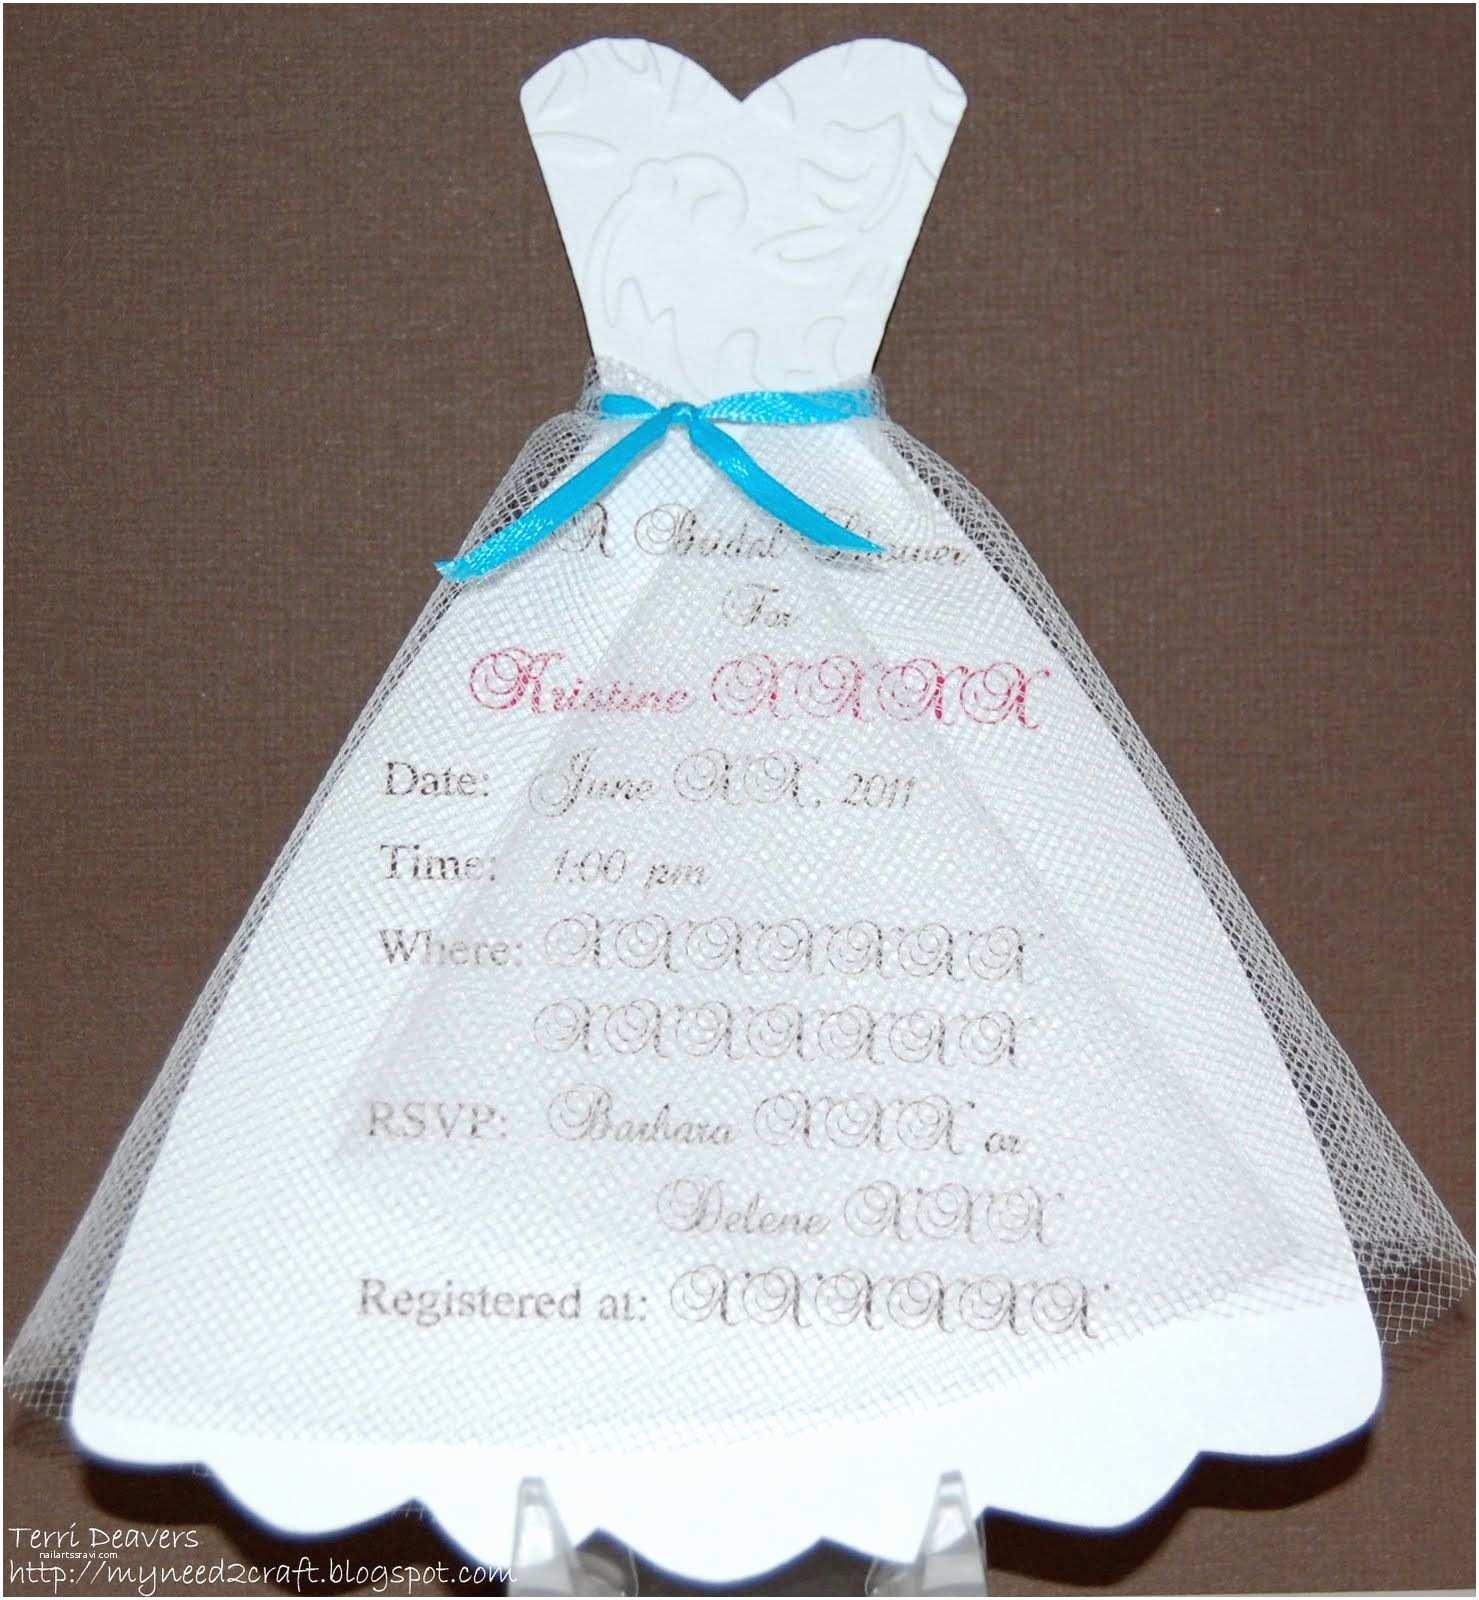 Bridal Shower Invitations Diy Bridal Shower Invitations Diy Bridal Shower